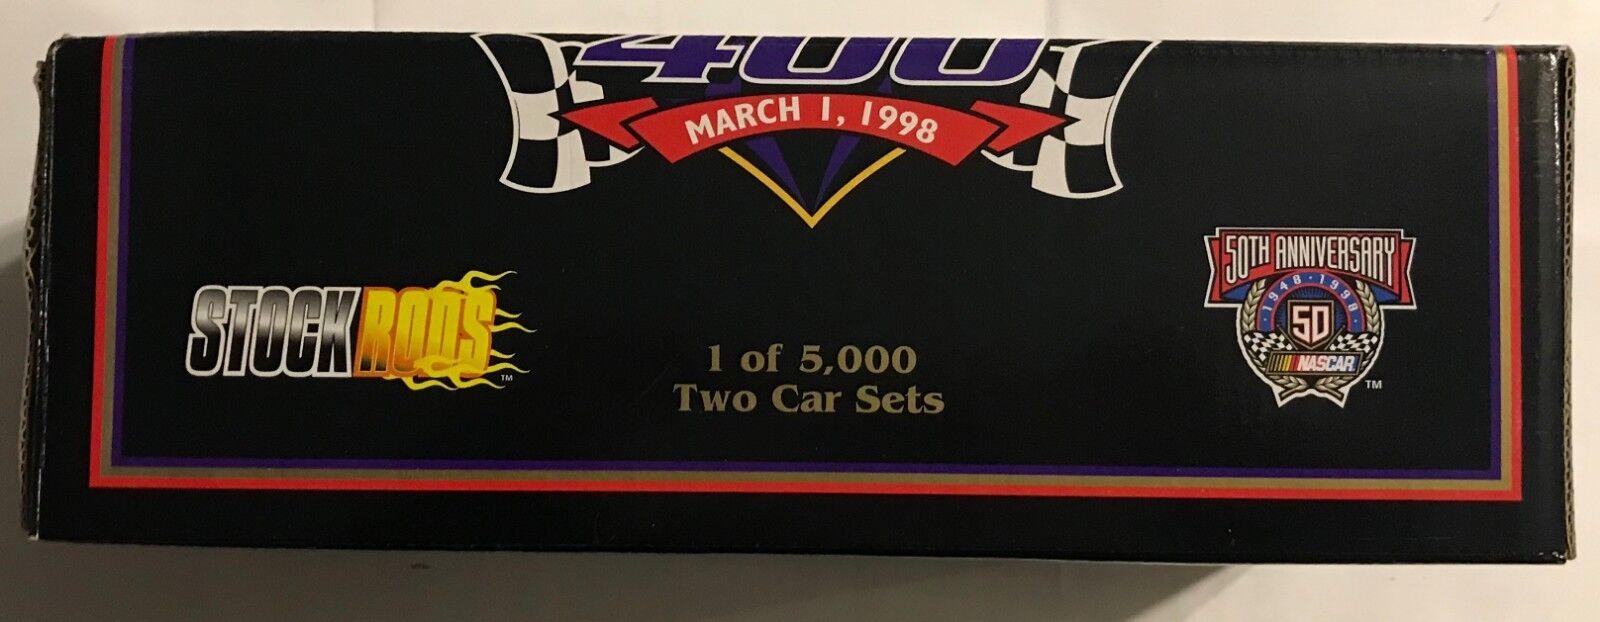 1998  6 Mark Martin 1933 Ford highboy  3722 3722 3722 5000 Dorado Cromo 2 coches 1 24th  3103 5c0e4f